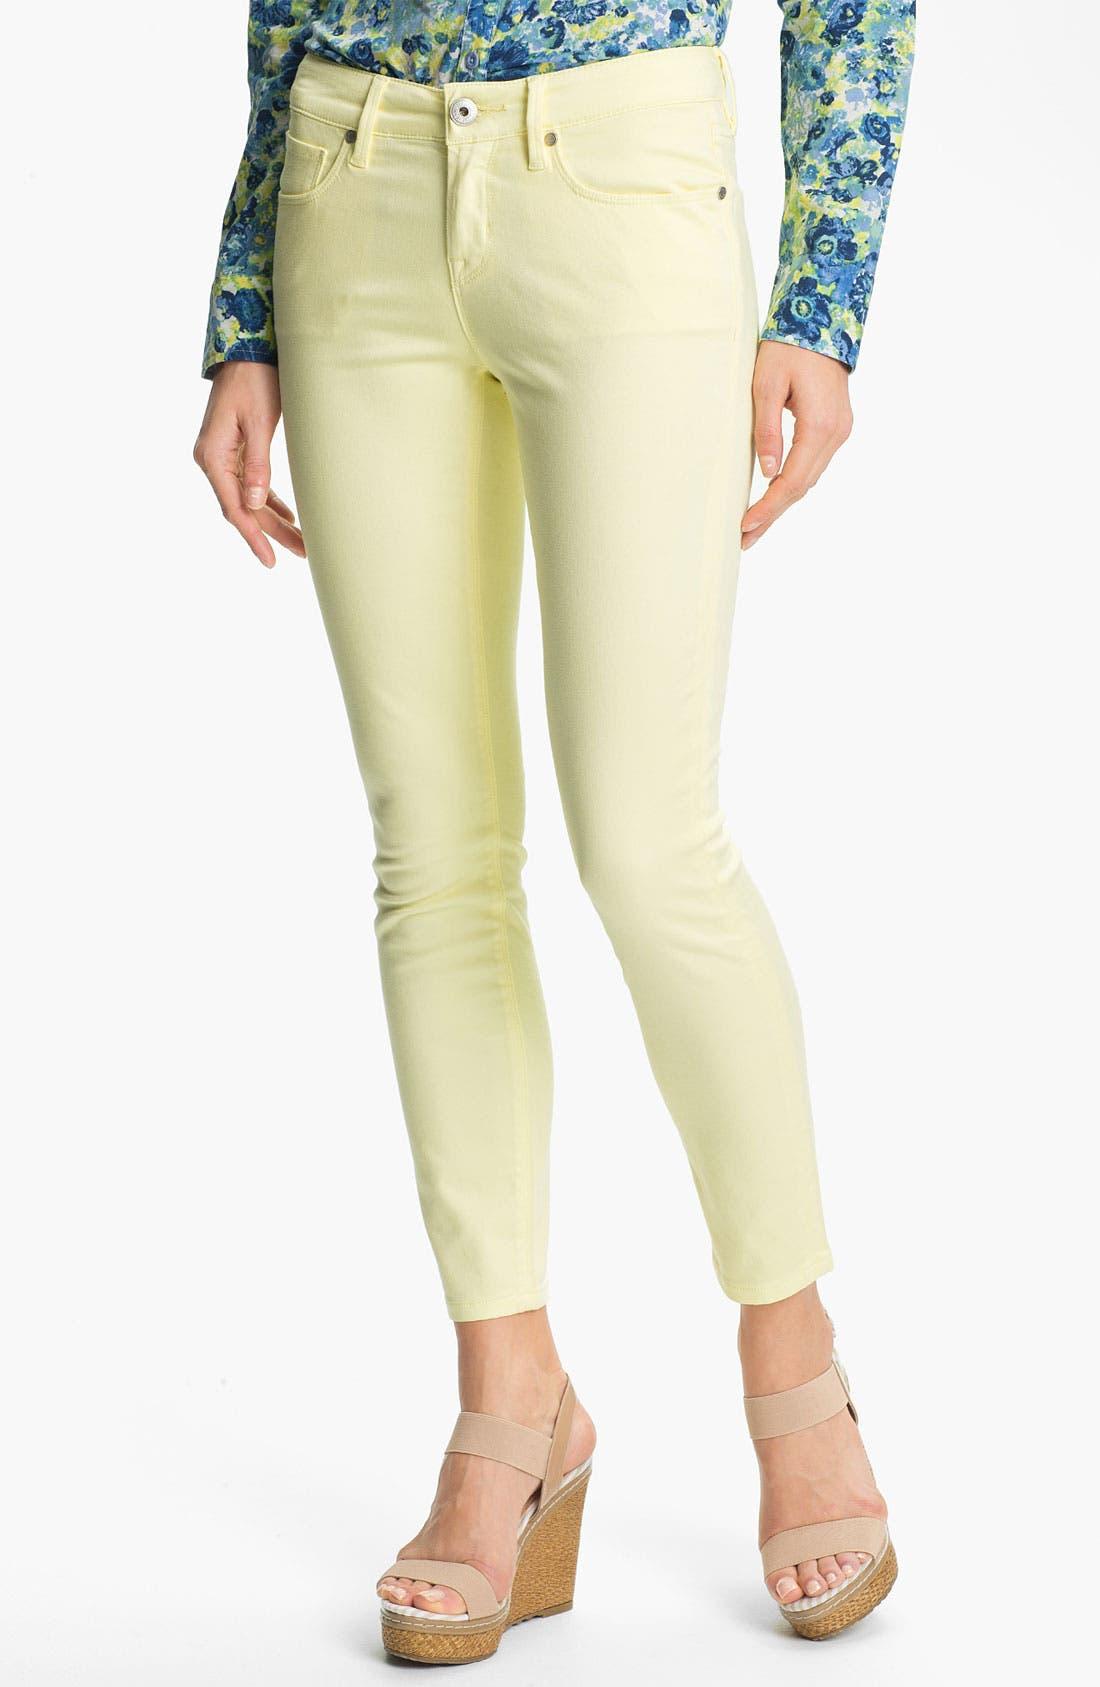 Main Image - Isaac Mizrahi Jeans Colored Skinny Jeans